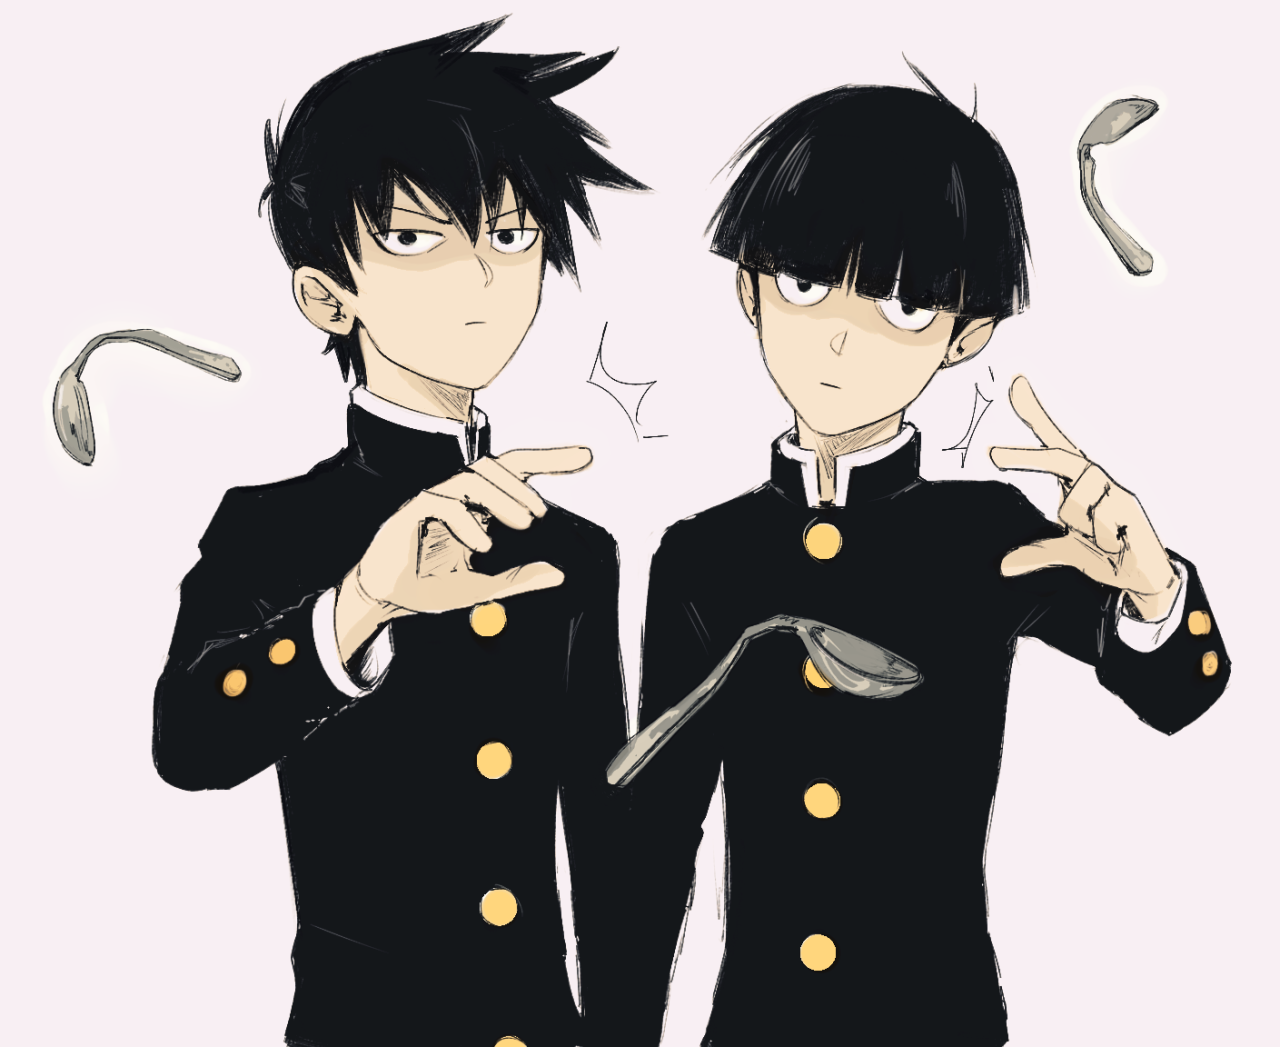 Mob Psycho 100 Kageyama Ritsu and Shigeo Mob Psycho